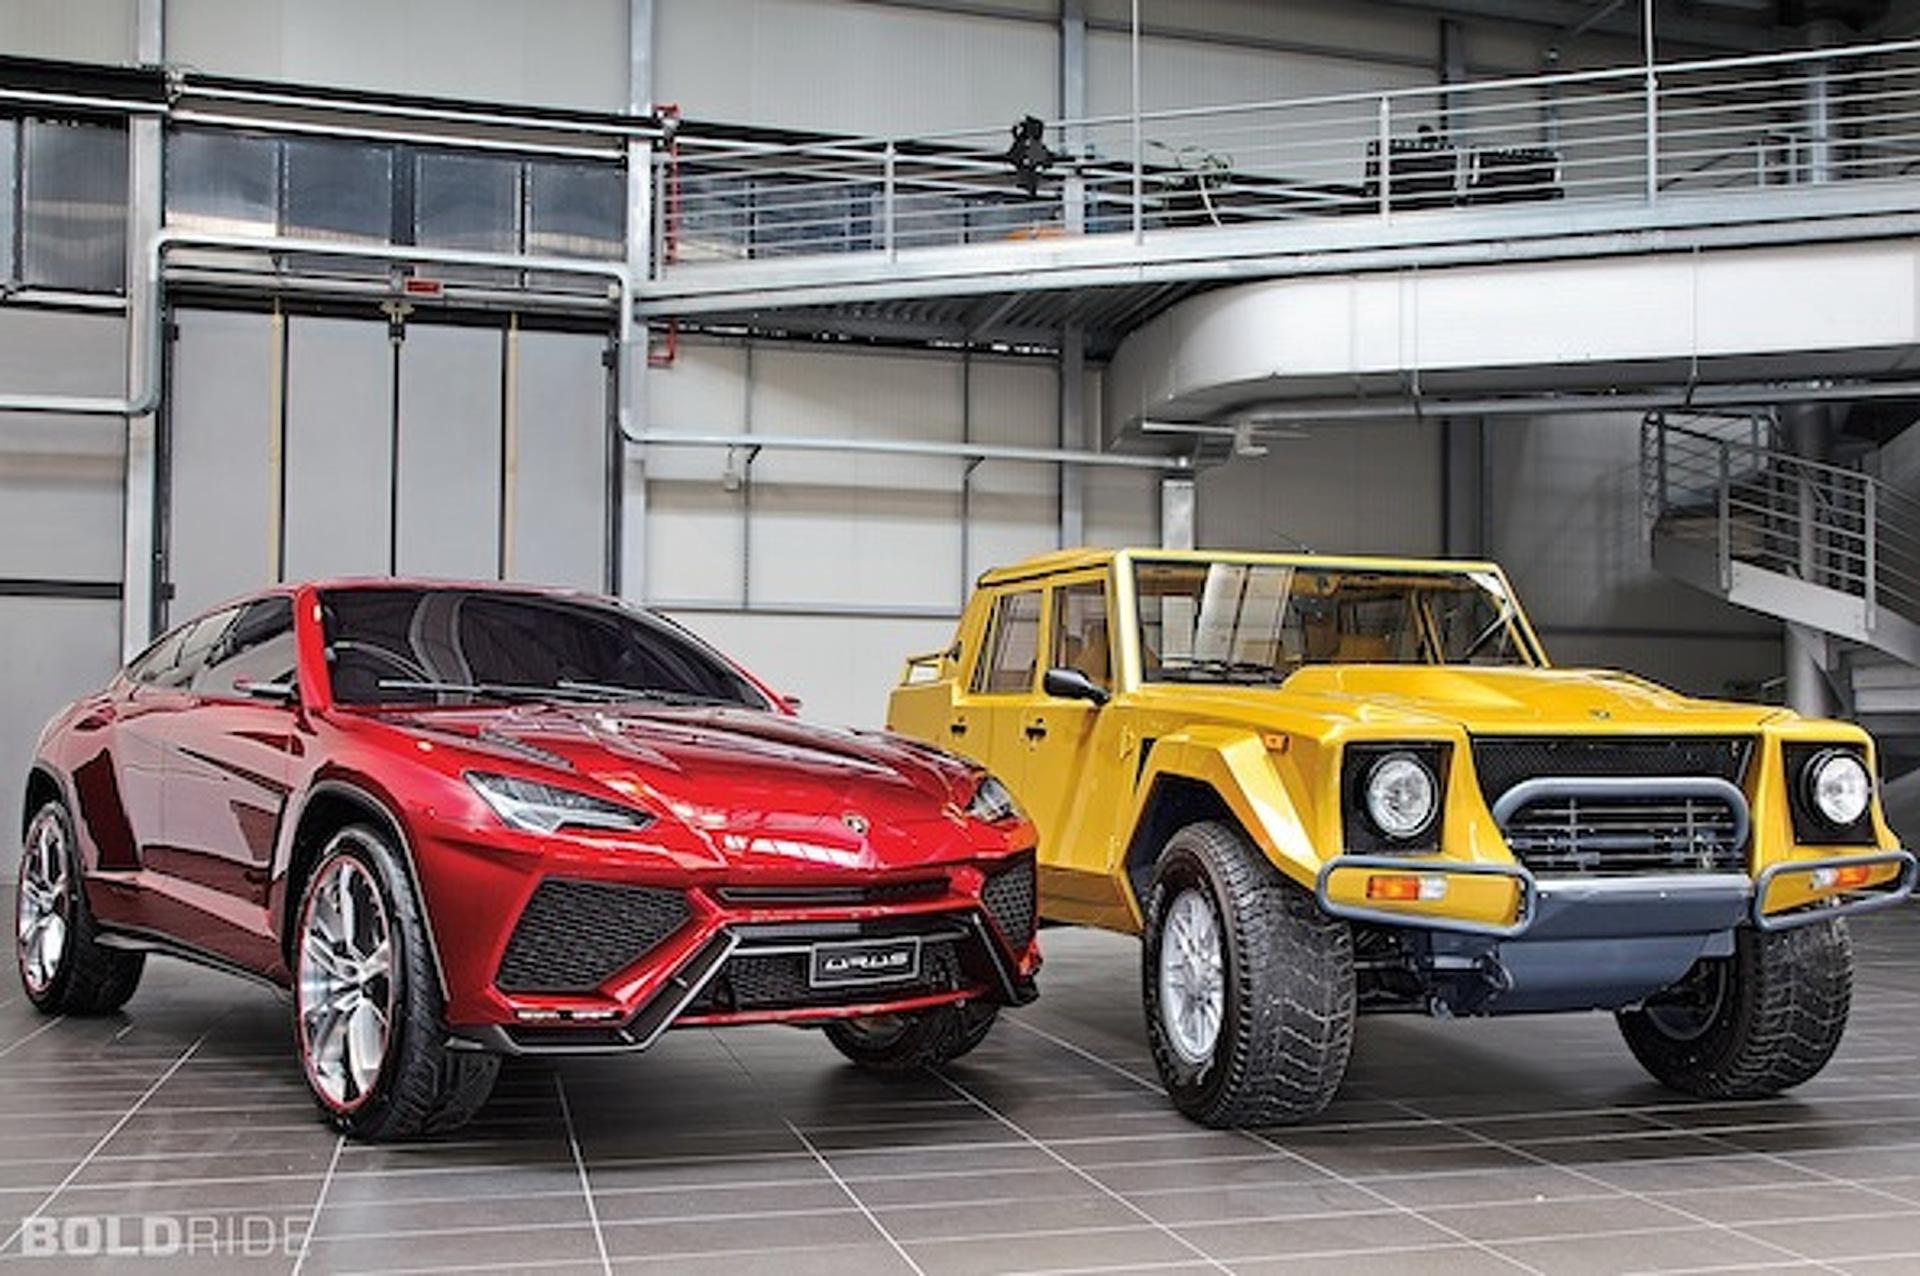 Lamborghini Urus SUV Concept at 2012 Beijing Auto Show - Front ...